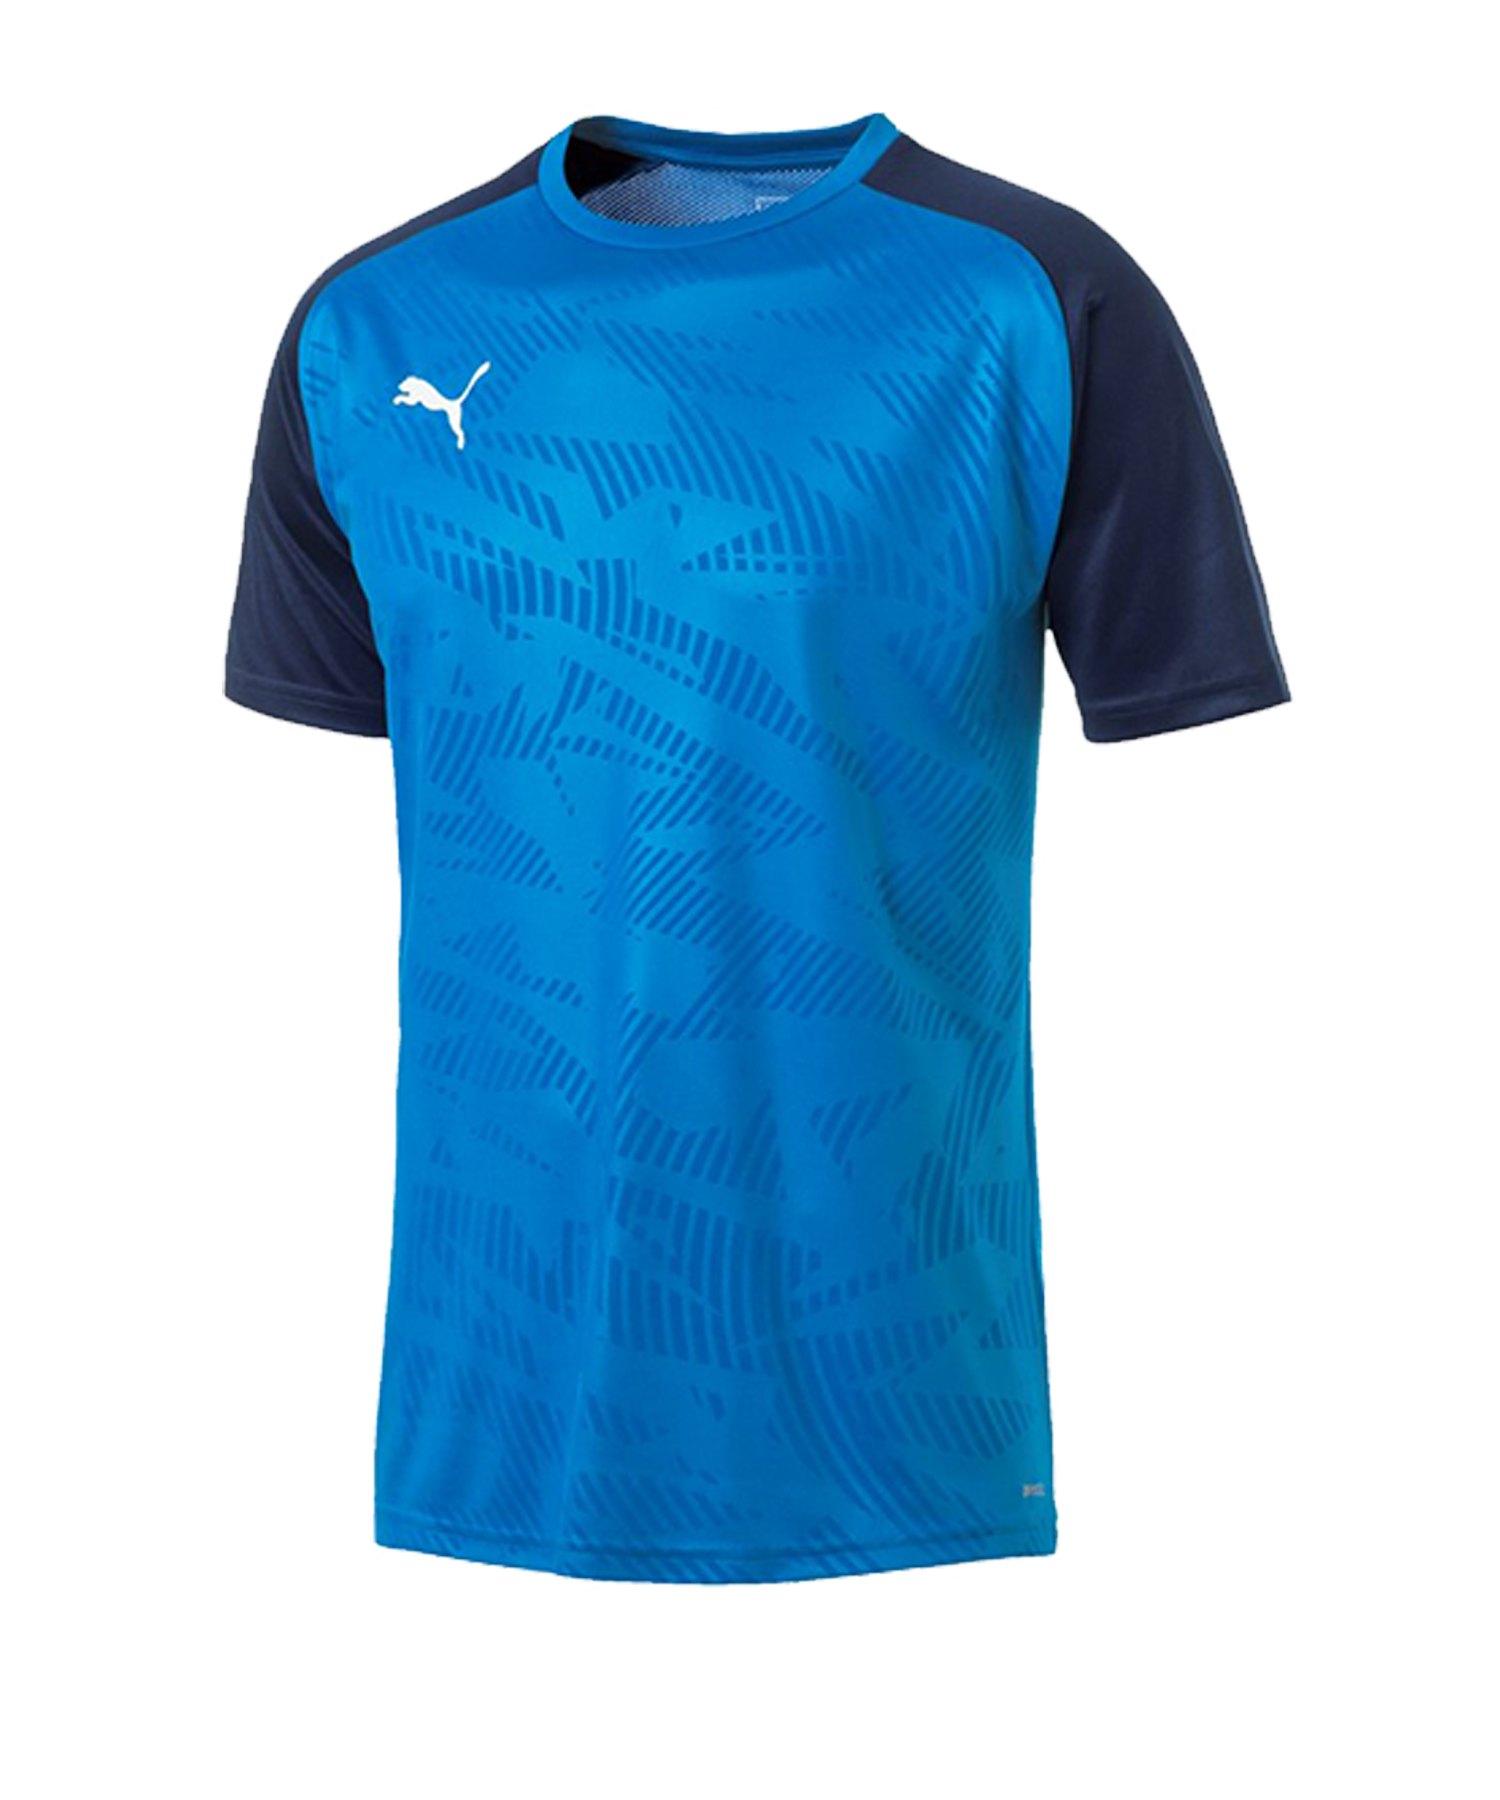 PUMA CUP Training Core T-Shirt Blau F02 - blau